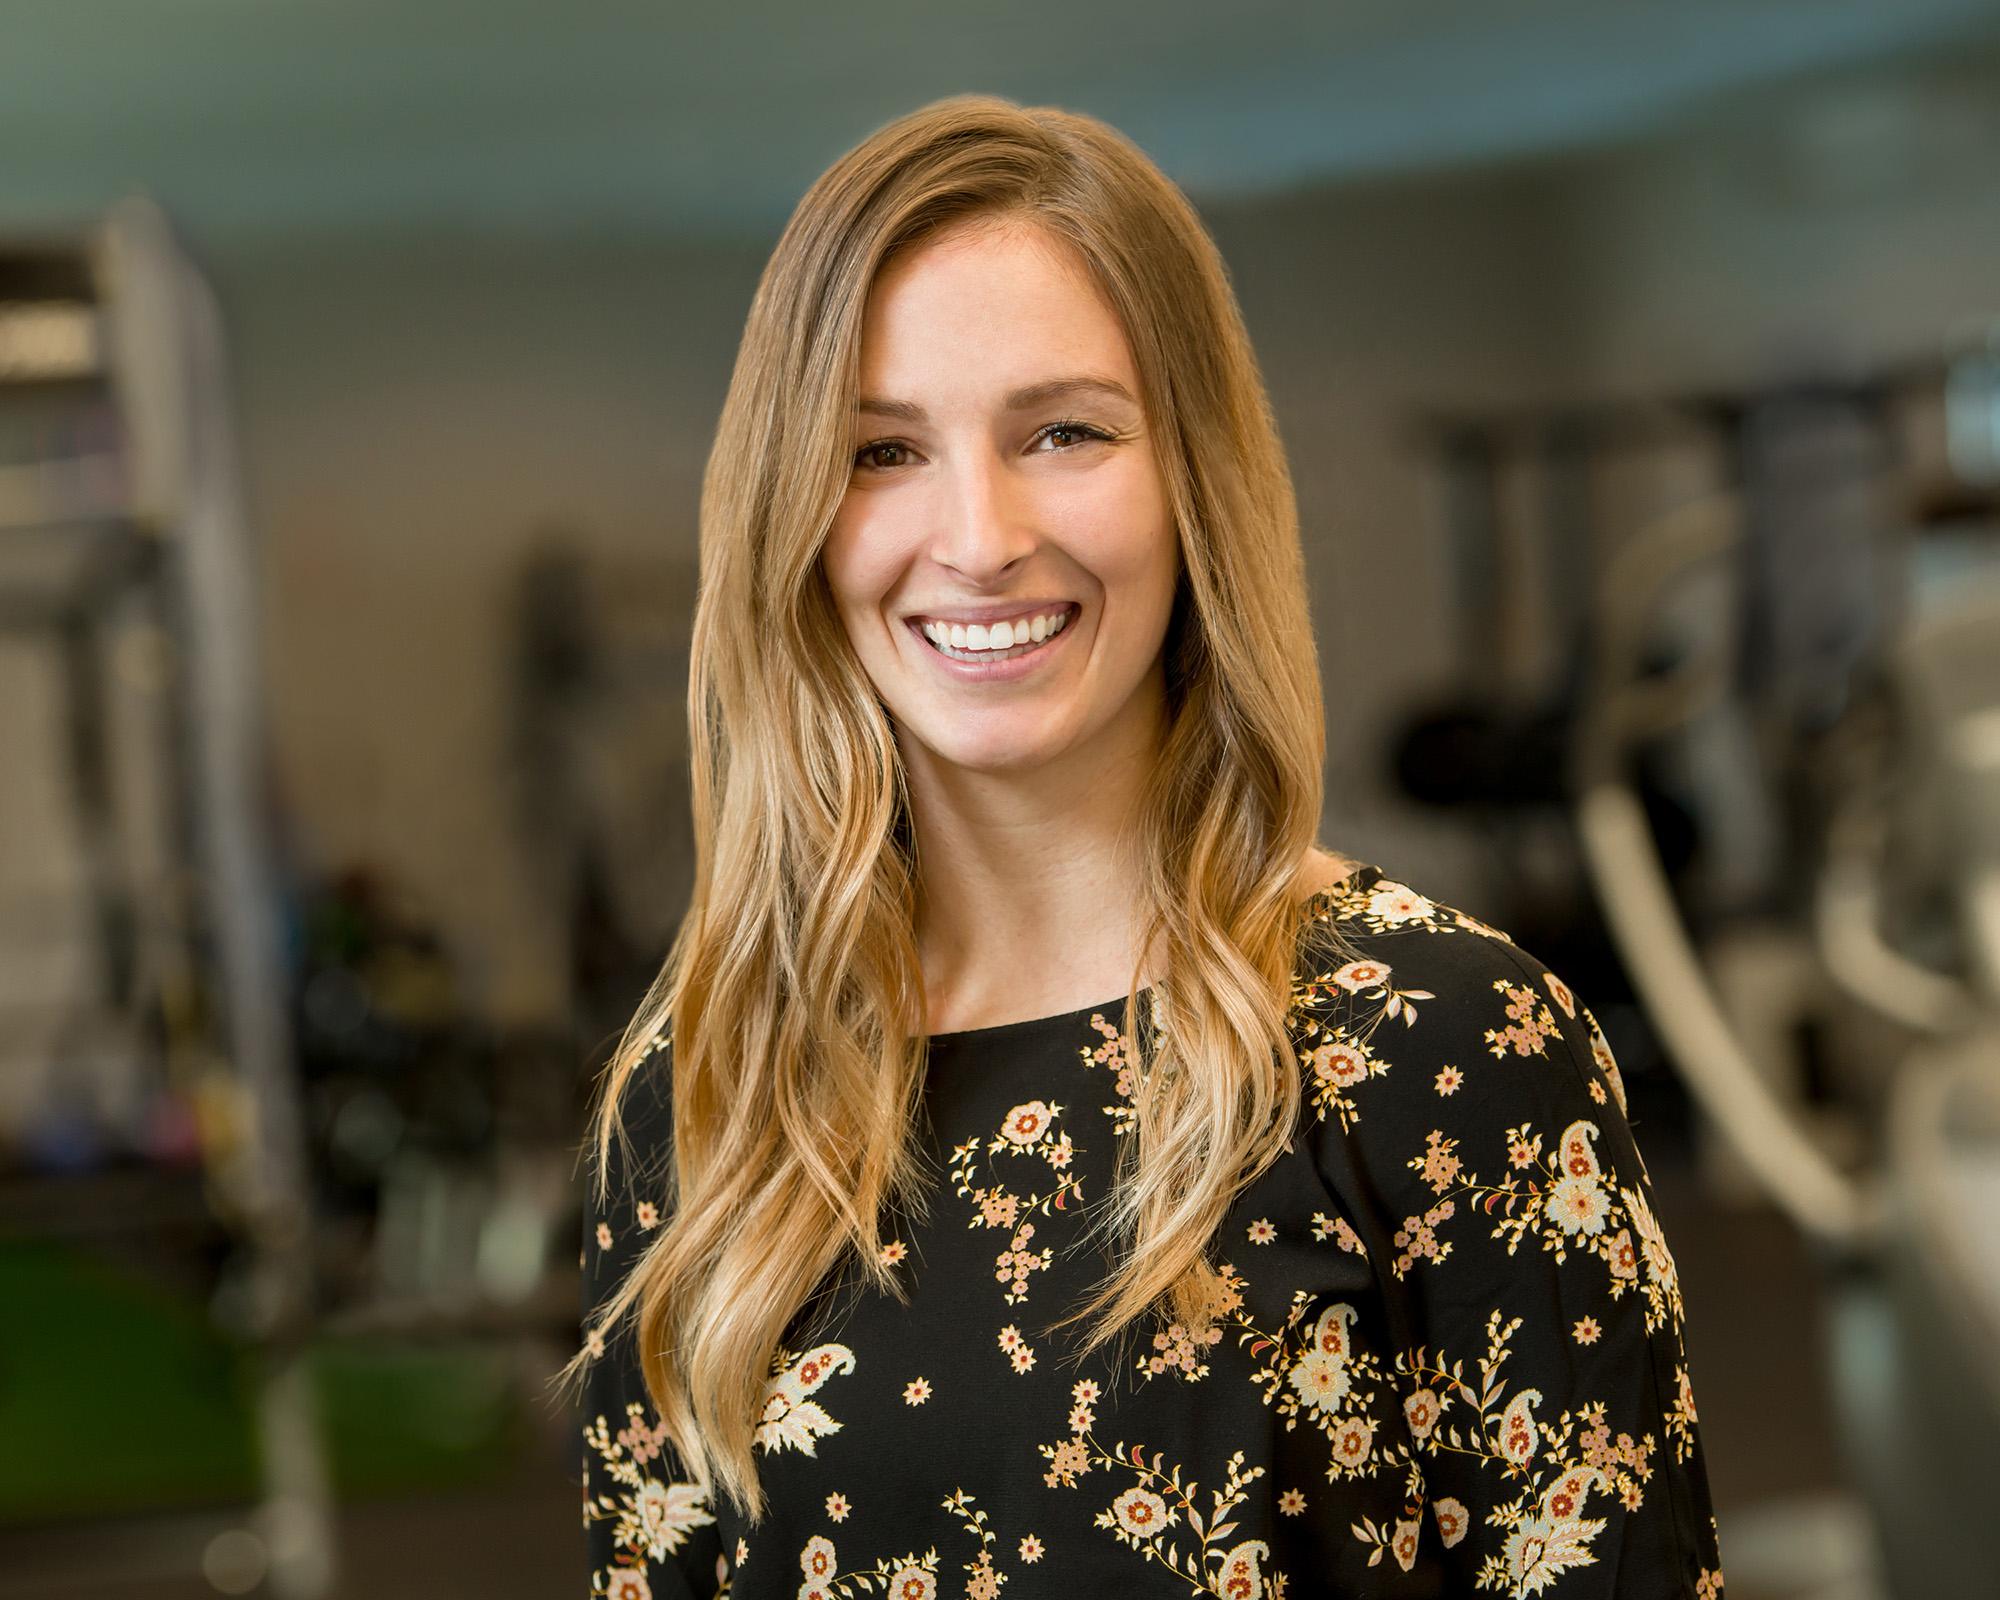 Megan Hotchkiss - PT, DPT, Staff Physical Therapist